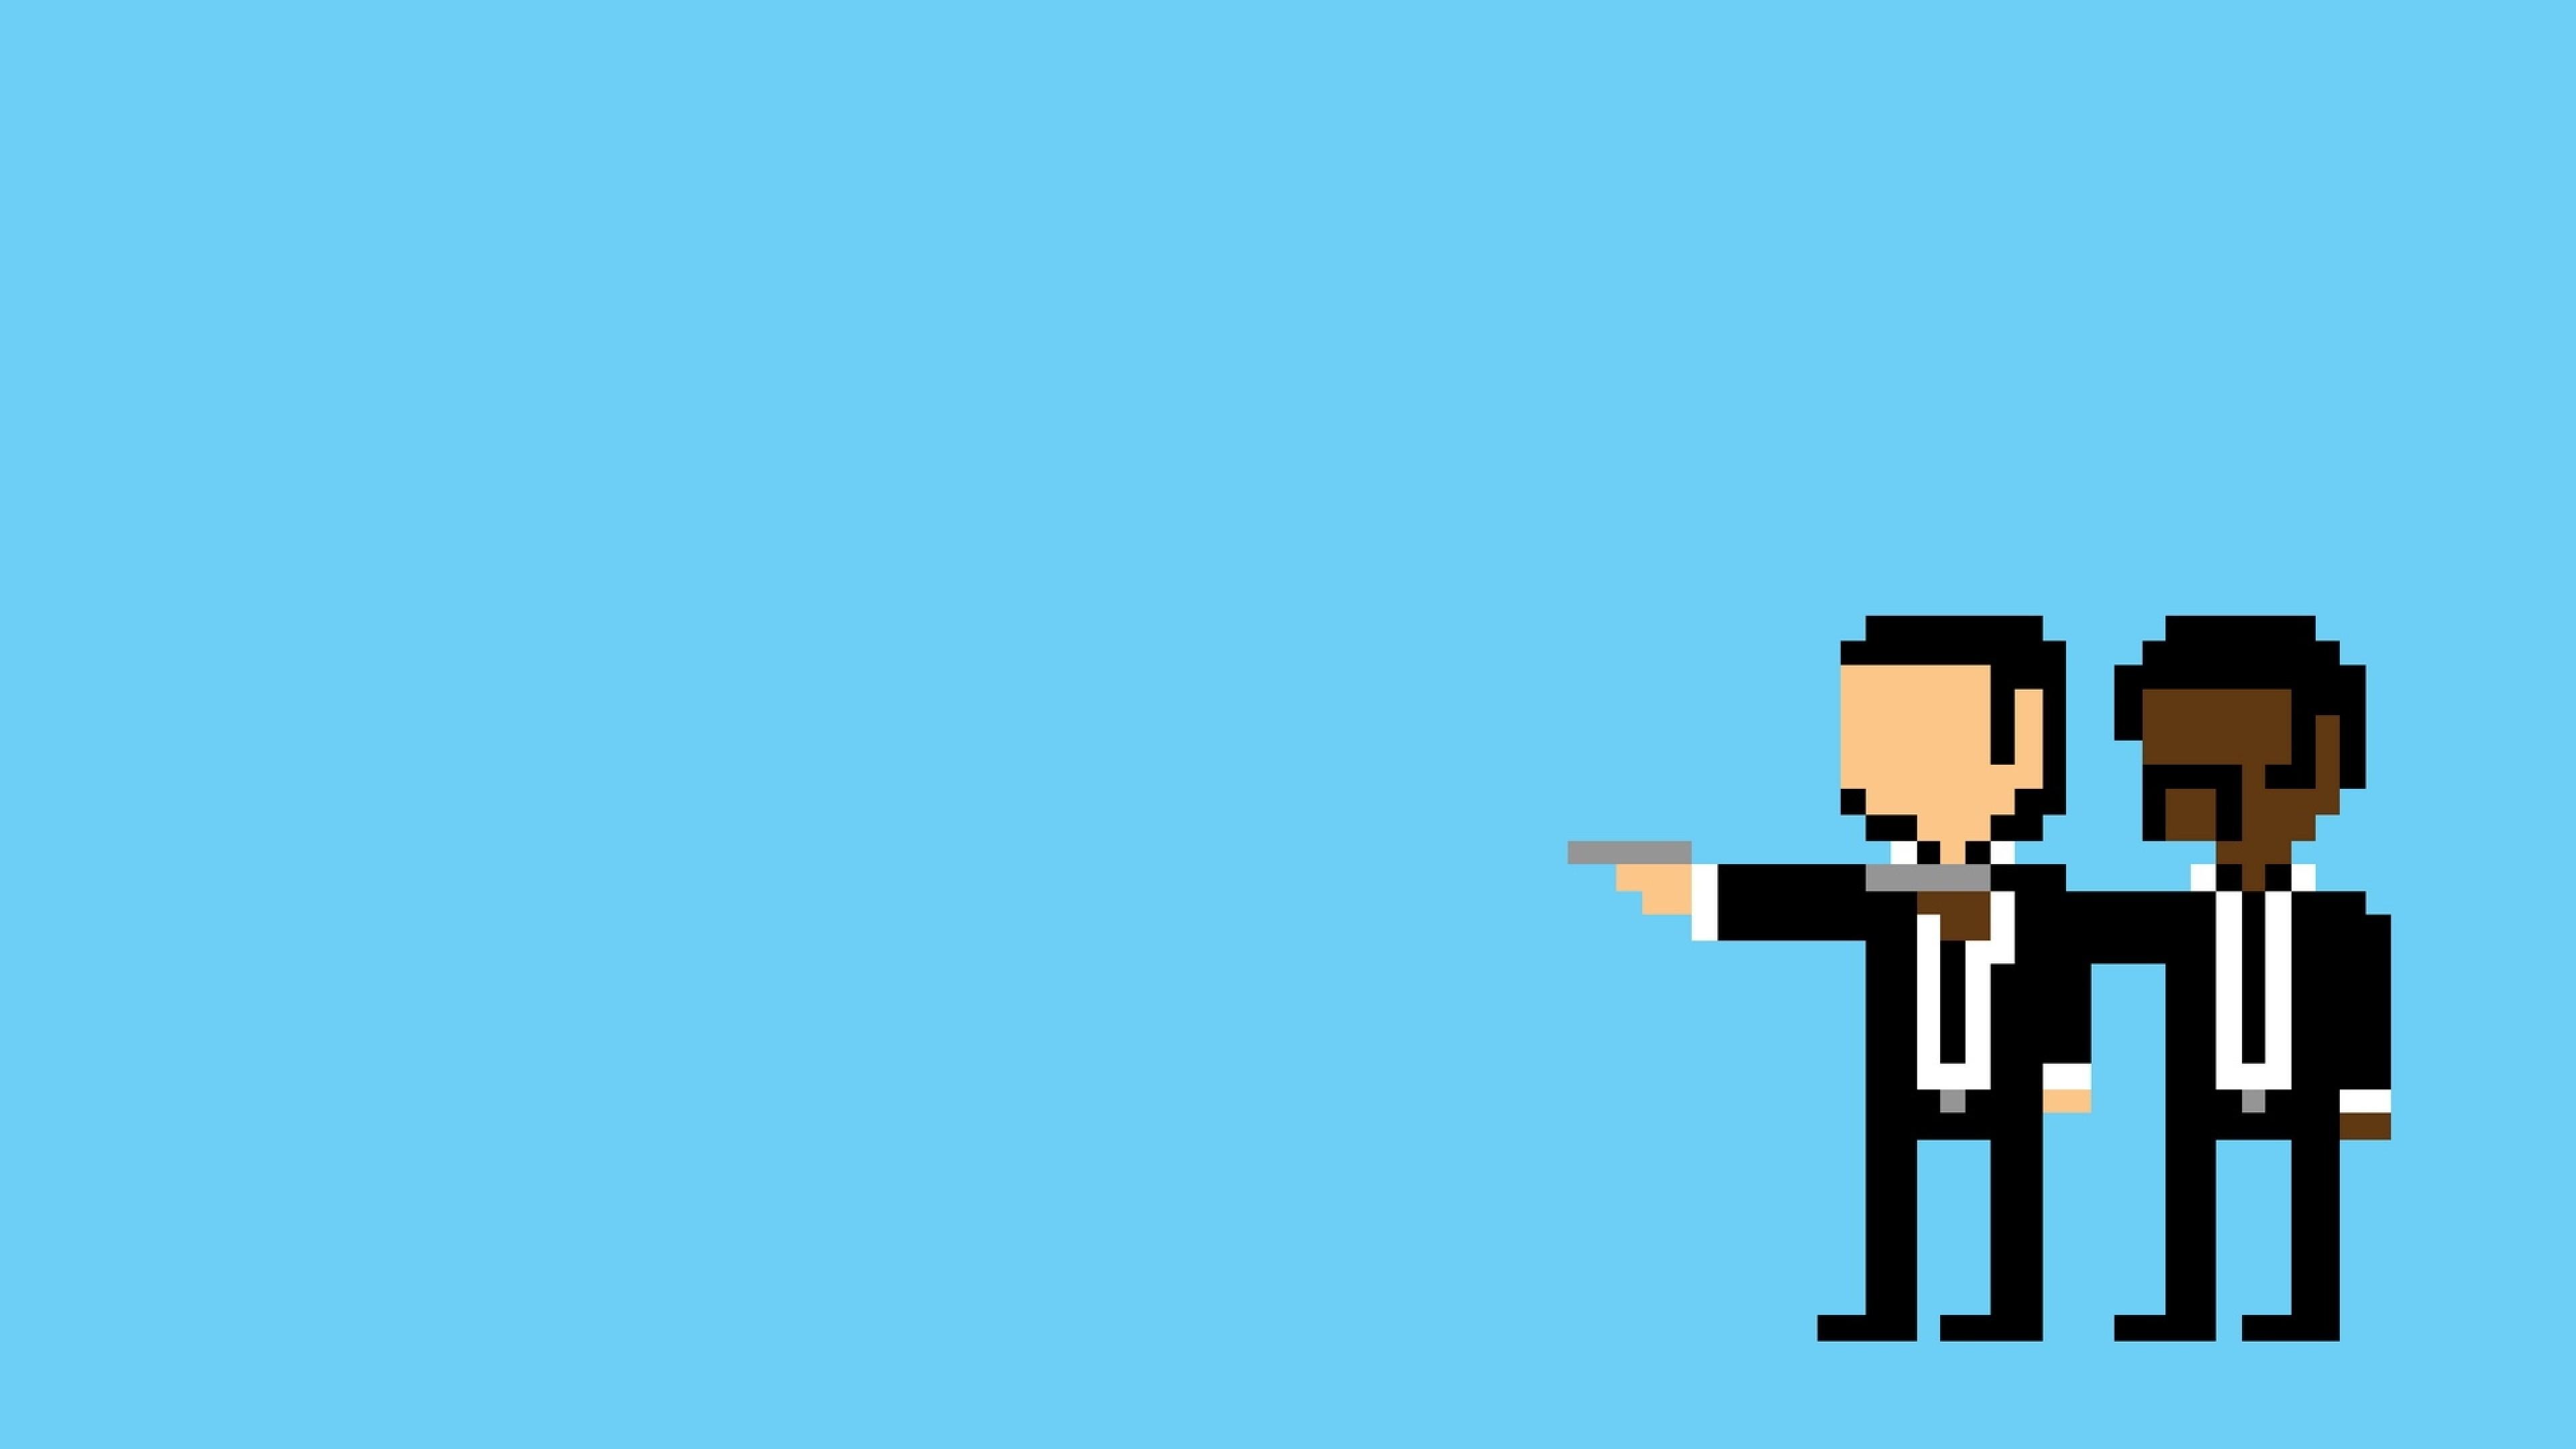 Download Wallpaper Pulp pixel, People, Minimalism, Pulp